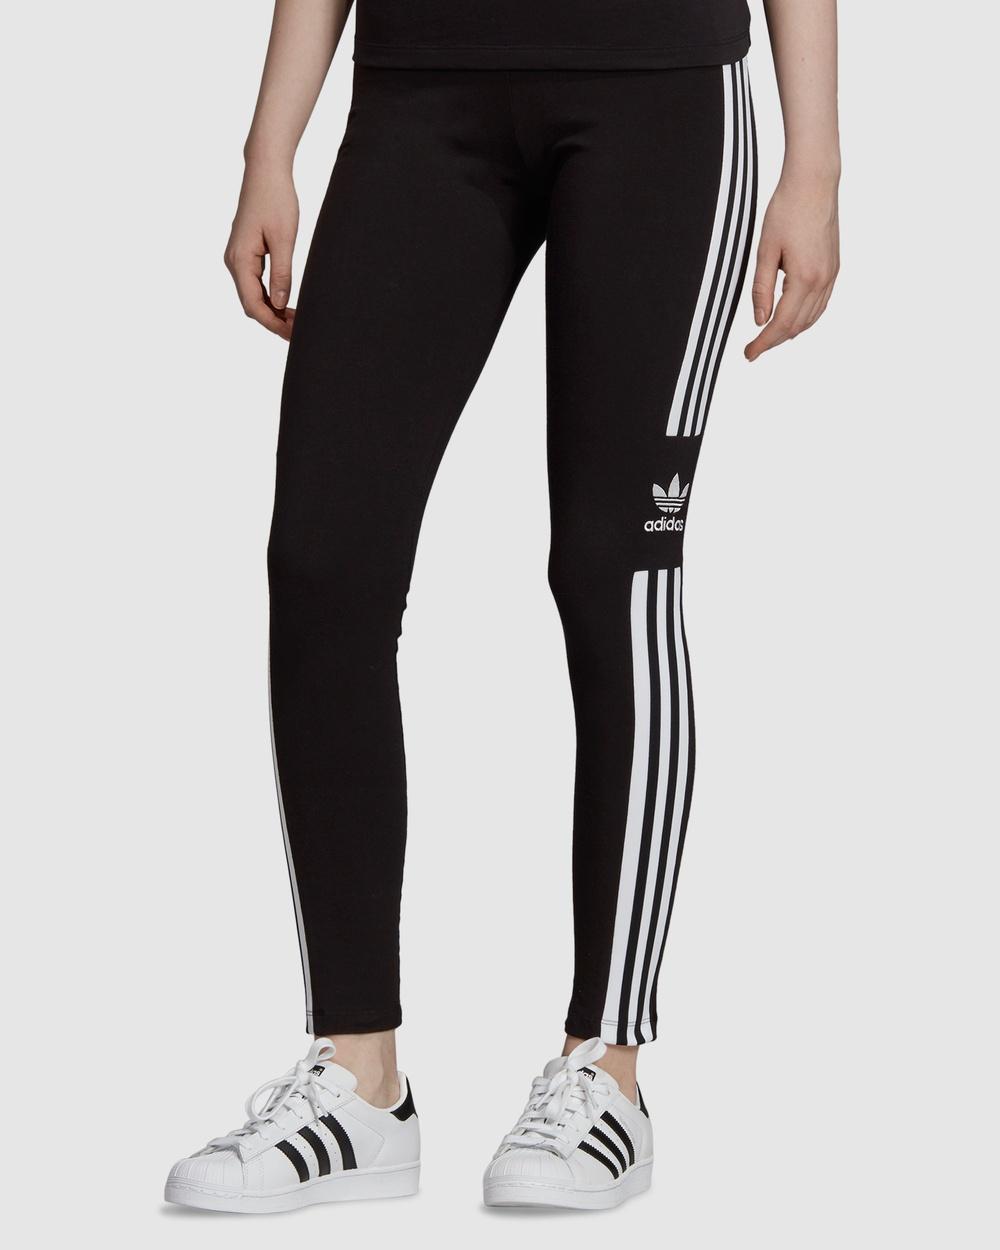 adidas Originals LOUNGEWEAR Trefoil Tights Sports Black